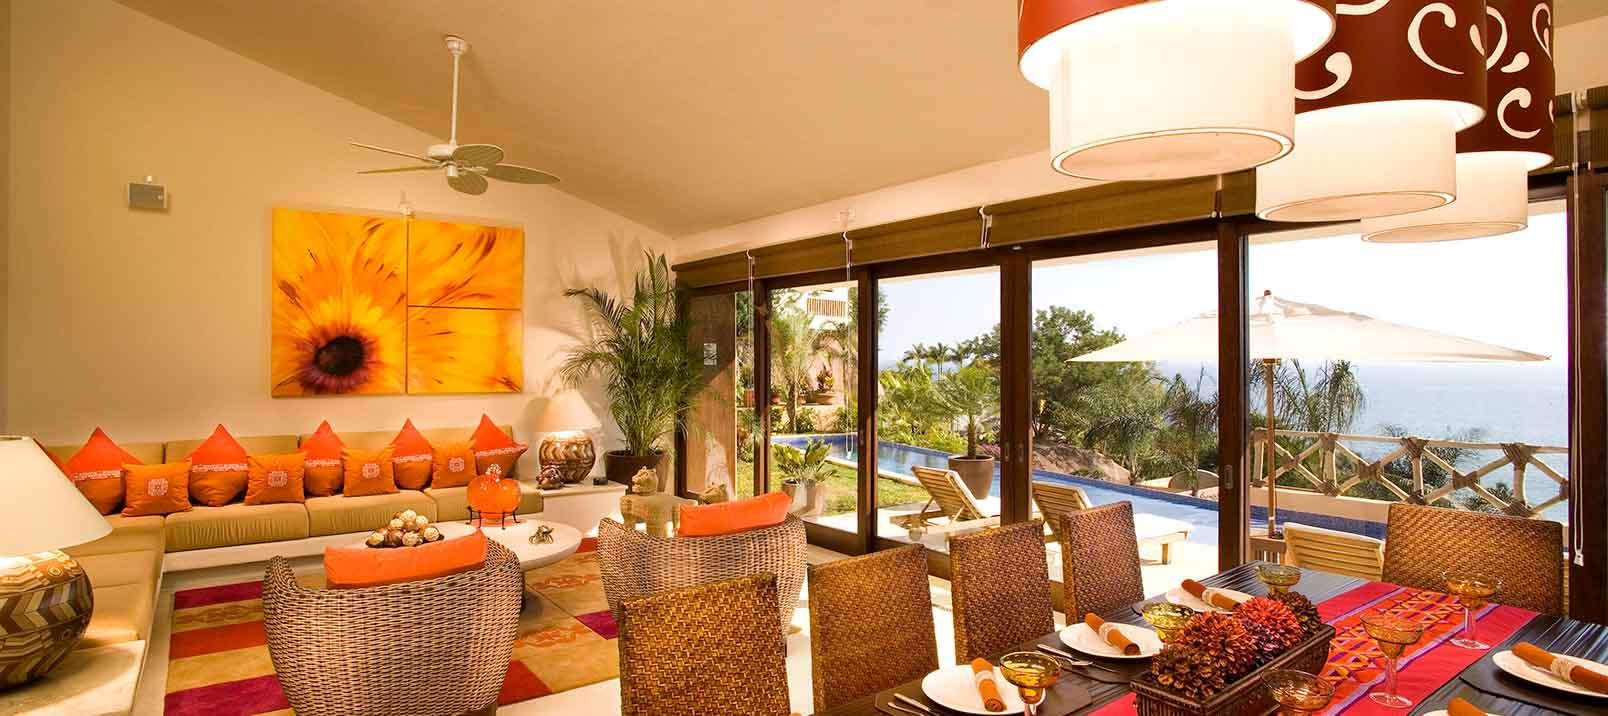 er-residence-header-disp-residence-real-del-mar-casa-del-puente-2.jpg